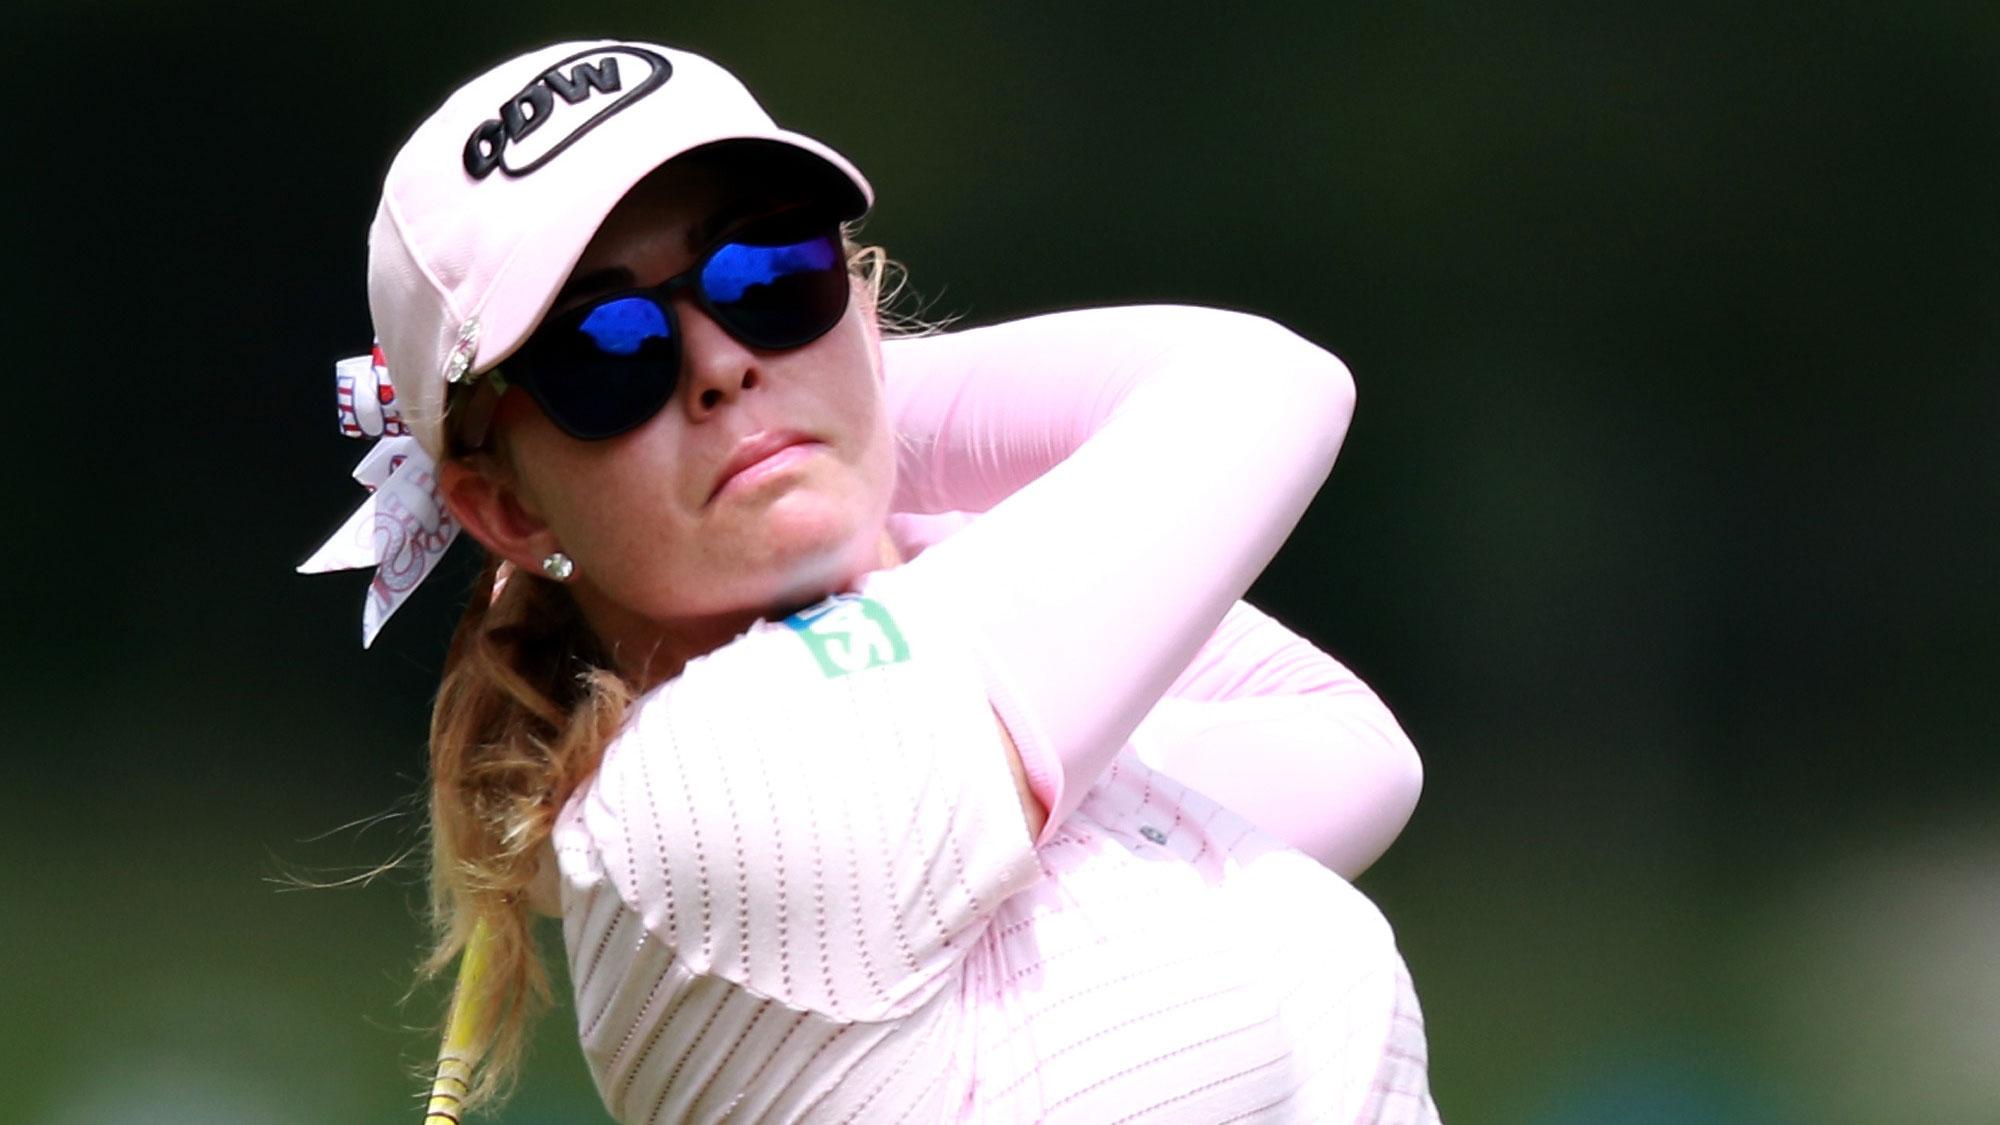 Lydia Ko shoots even par round at LPGA Malaysia